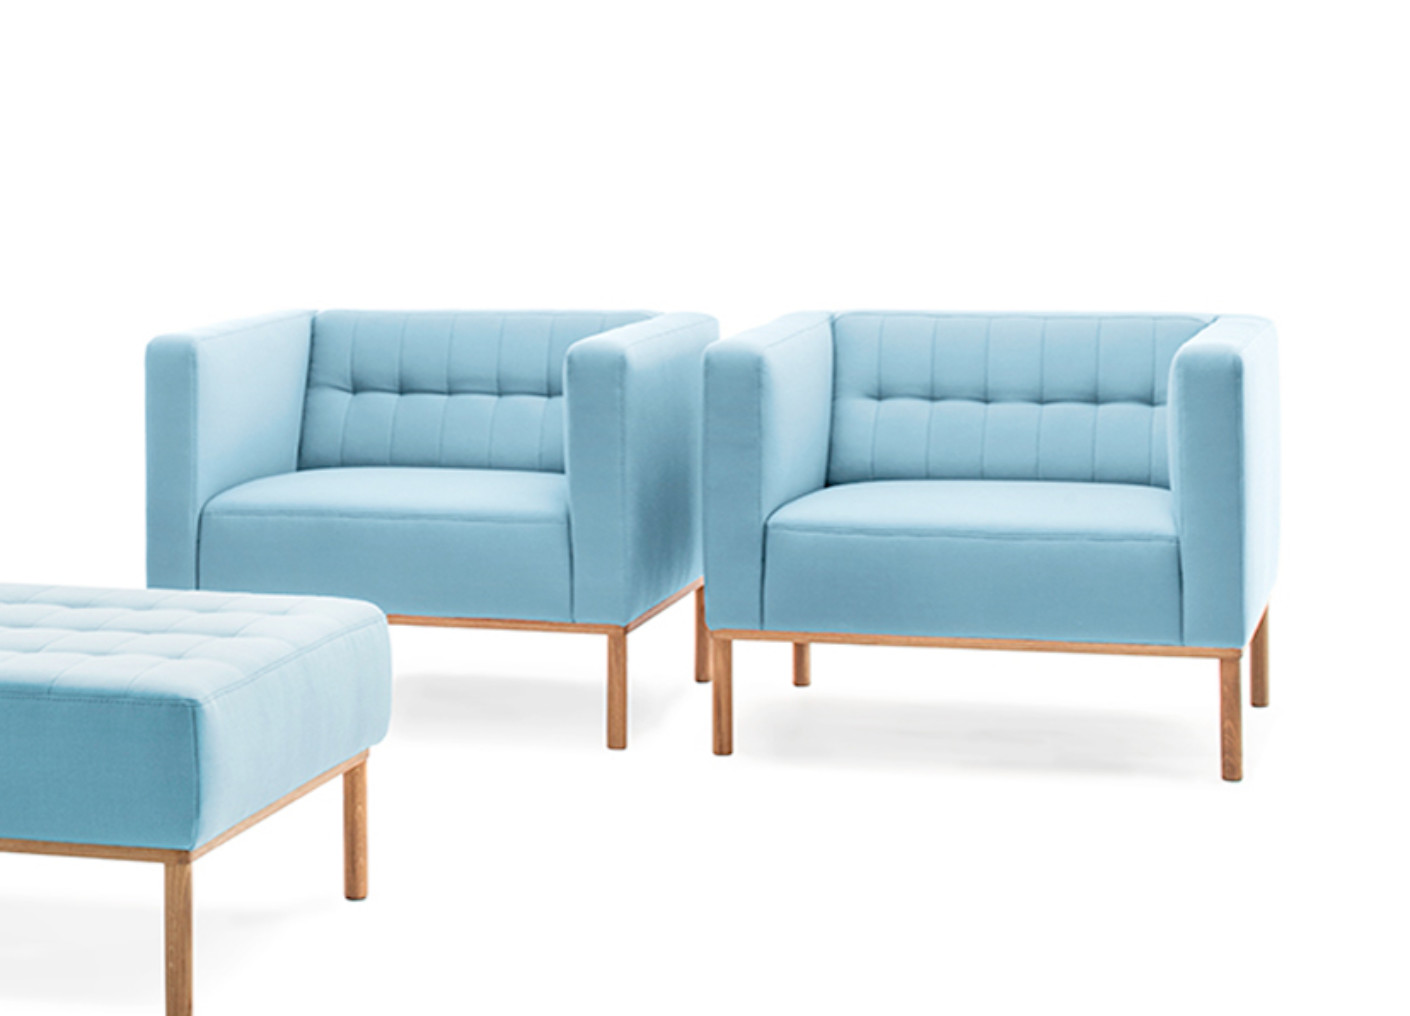 otto esszimmer sessel fabulous beliebt esszimmer ideen glamours esstisch sessel liebreizend. Black Bedroom Furniture Sets. Home Design Ideas